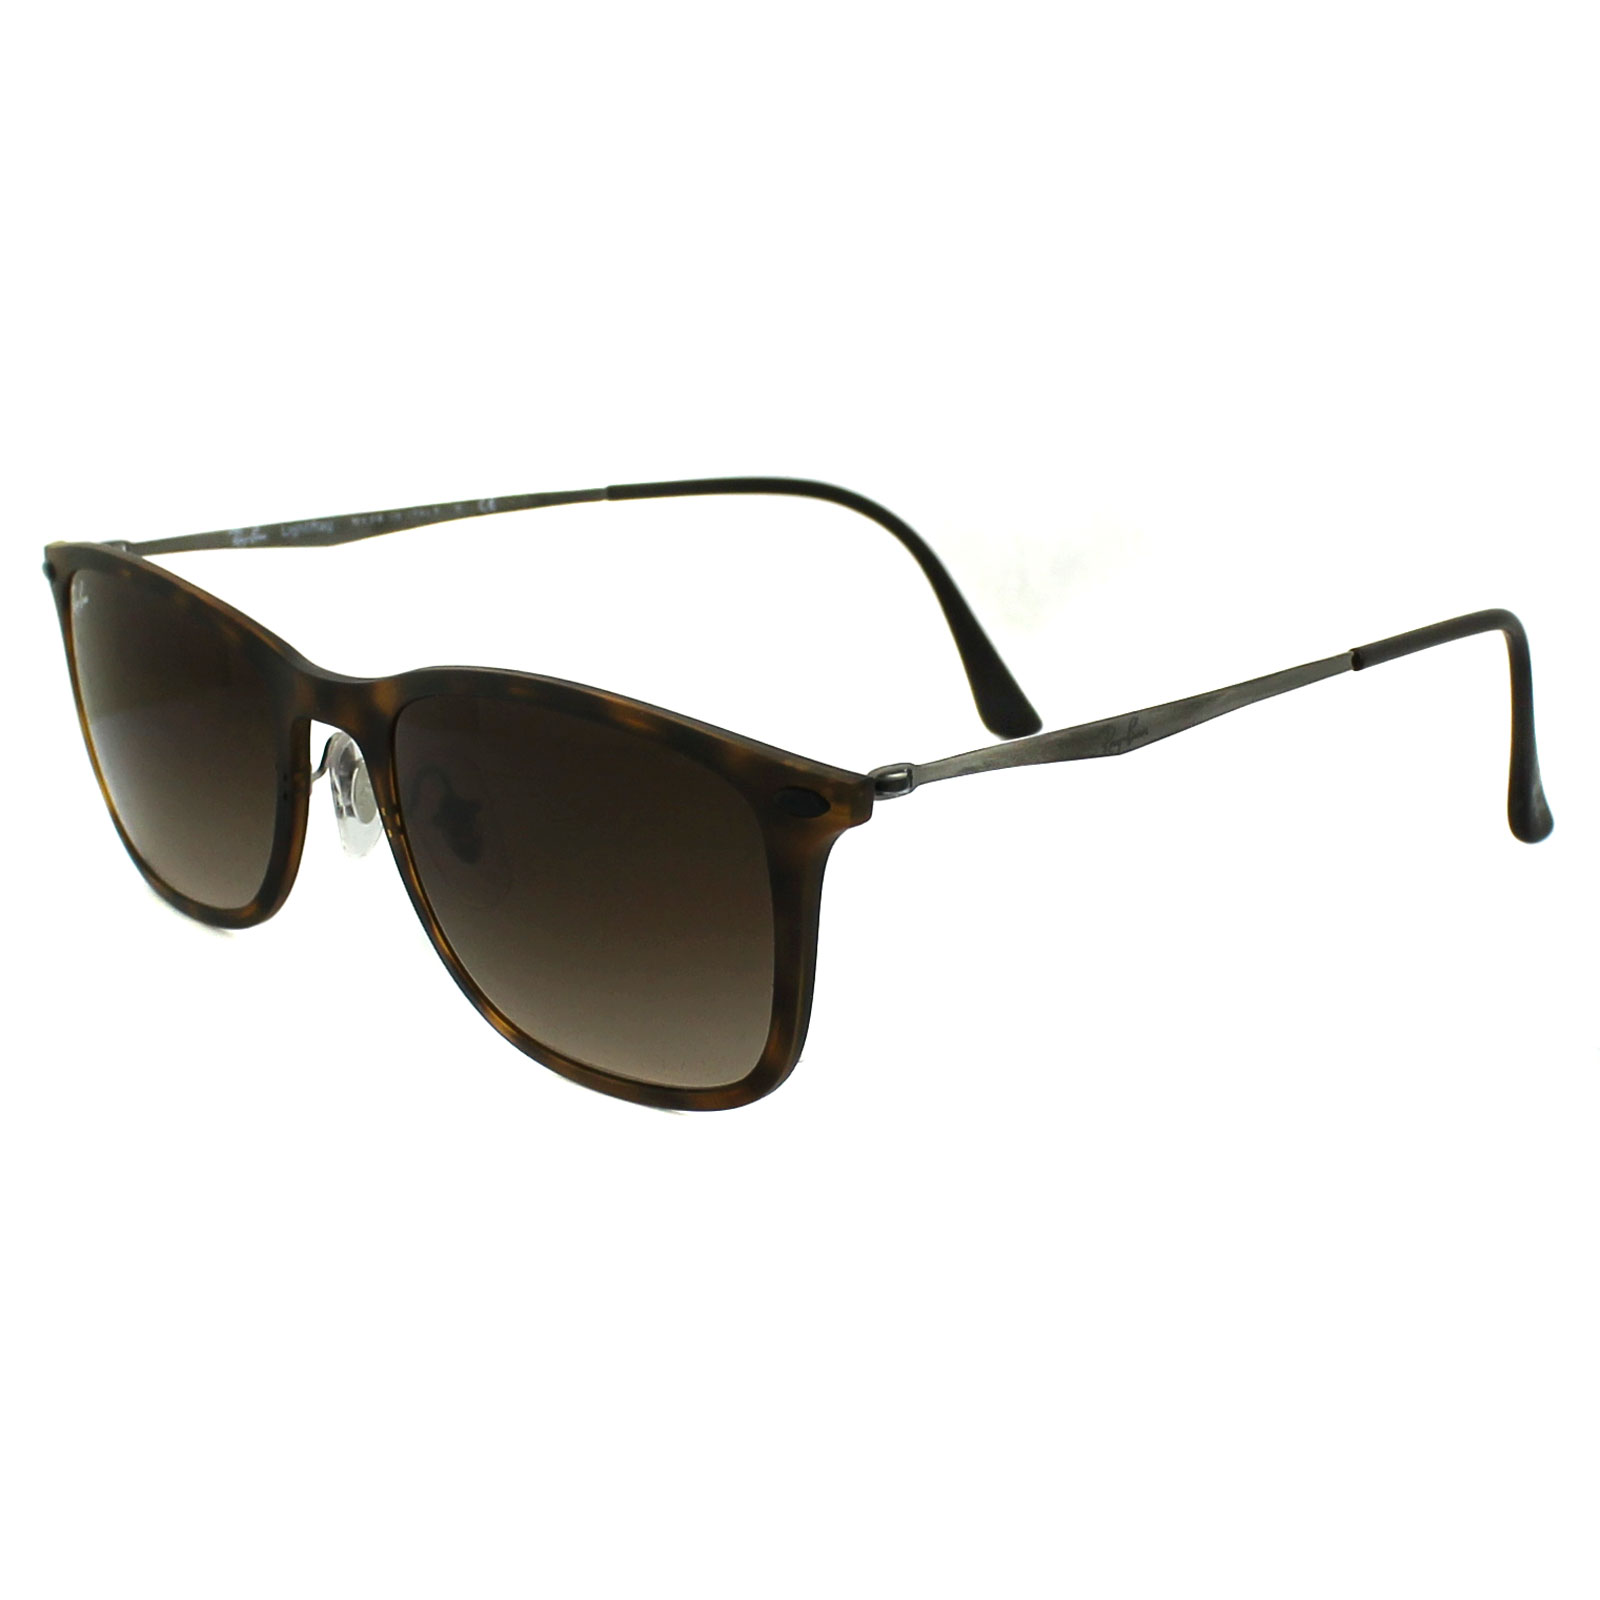 Ray ban sunglasses gradient - Sentinel Ray Ban Sunglasses New Wayfarer Light Ray 4225 894 13 Tortoise Brown Gradient